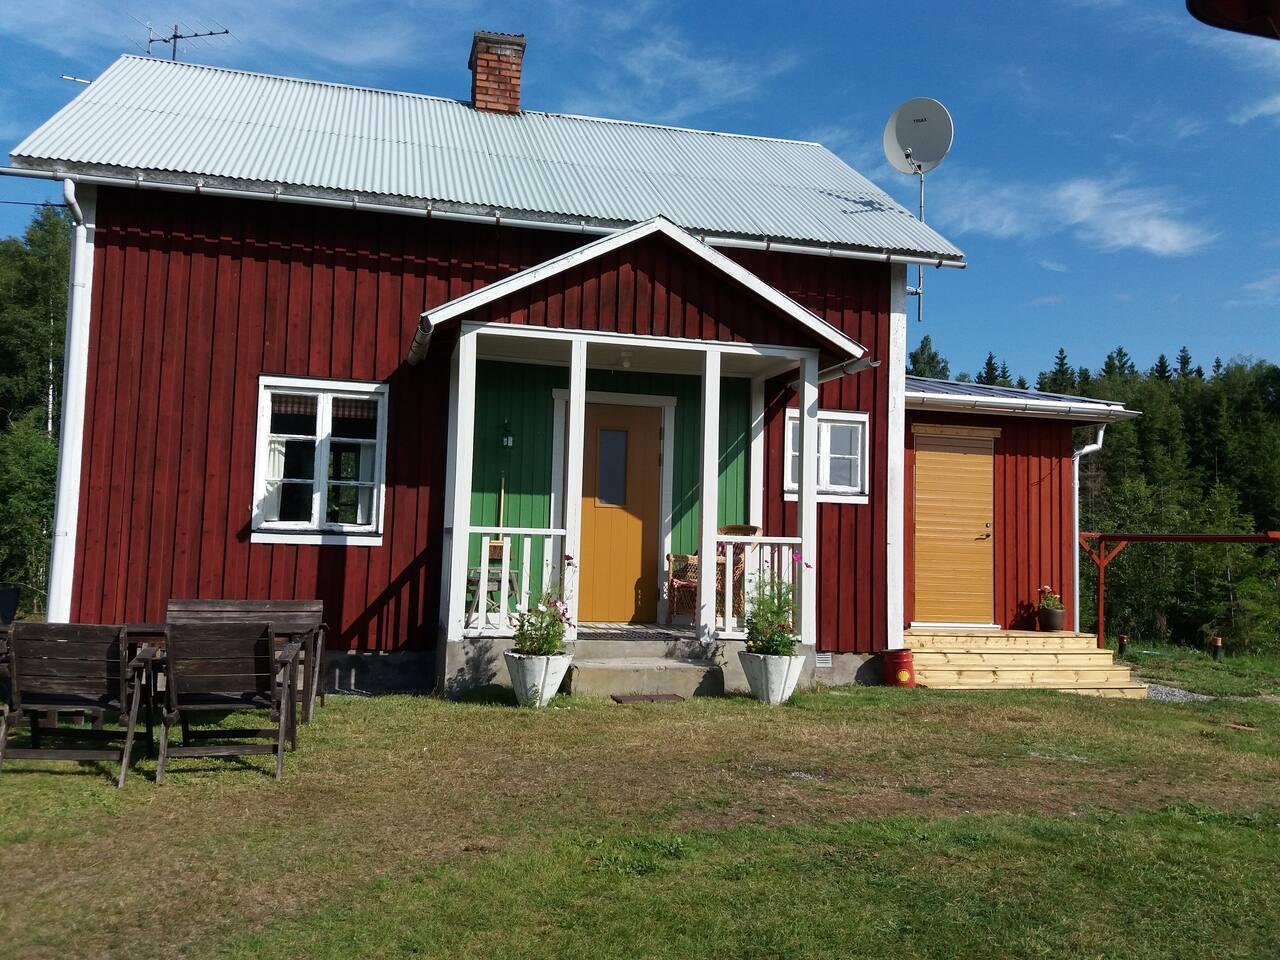 Krrsmon Gunnarskog karta - unam.net